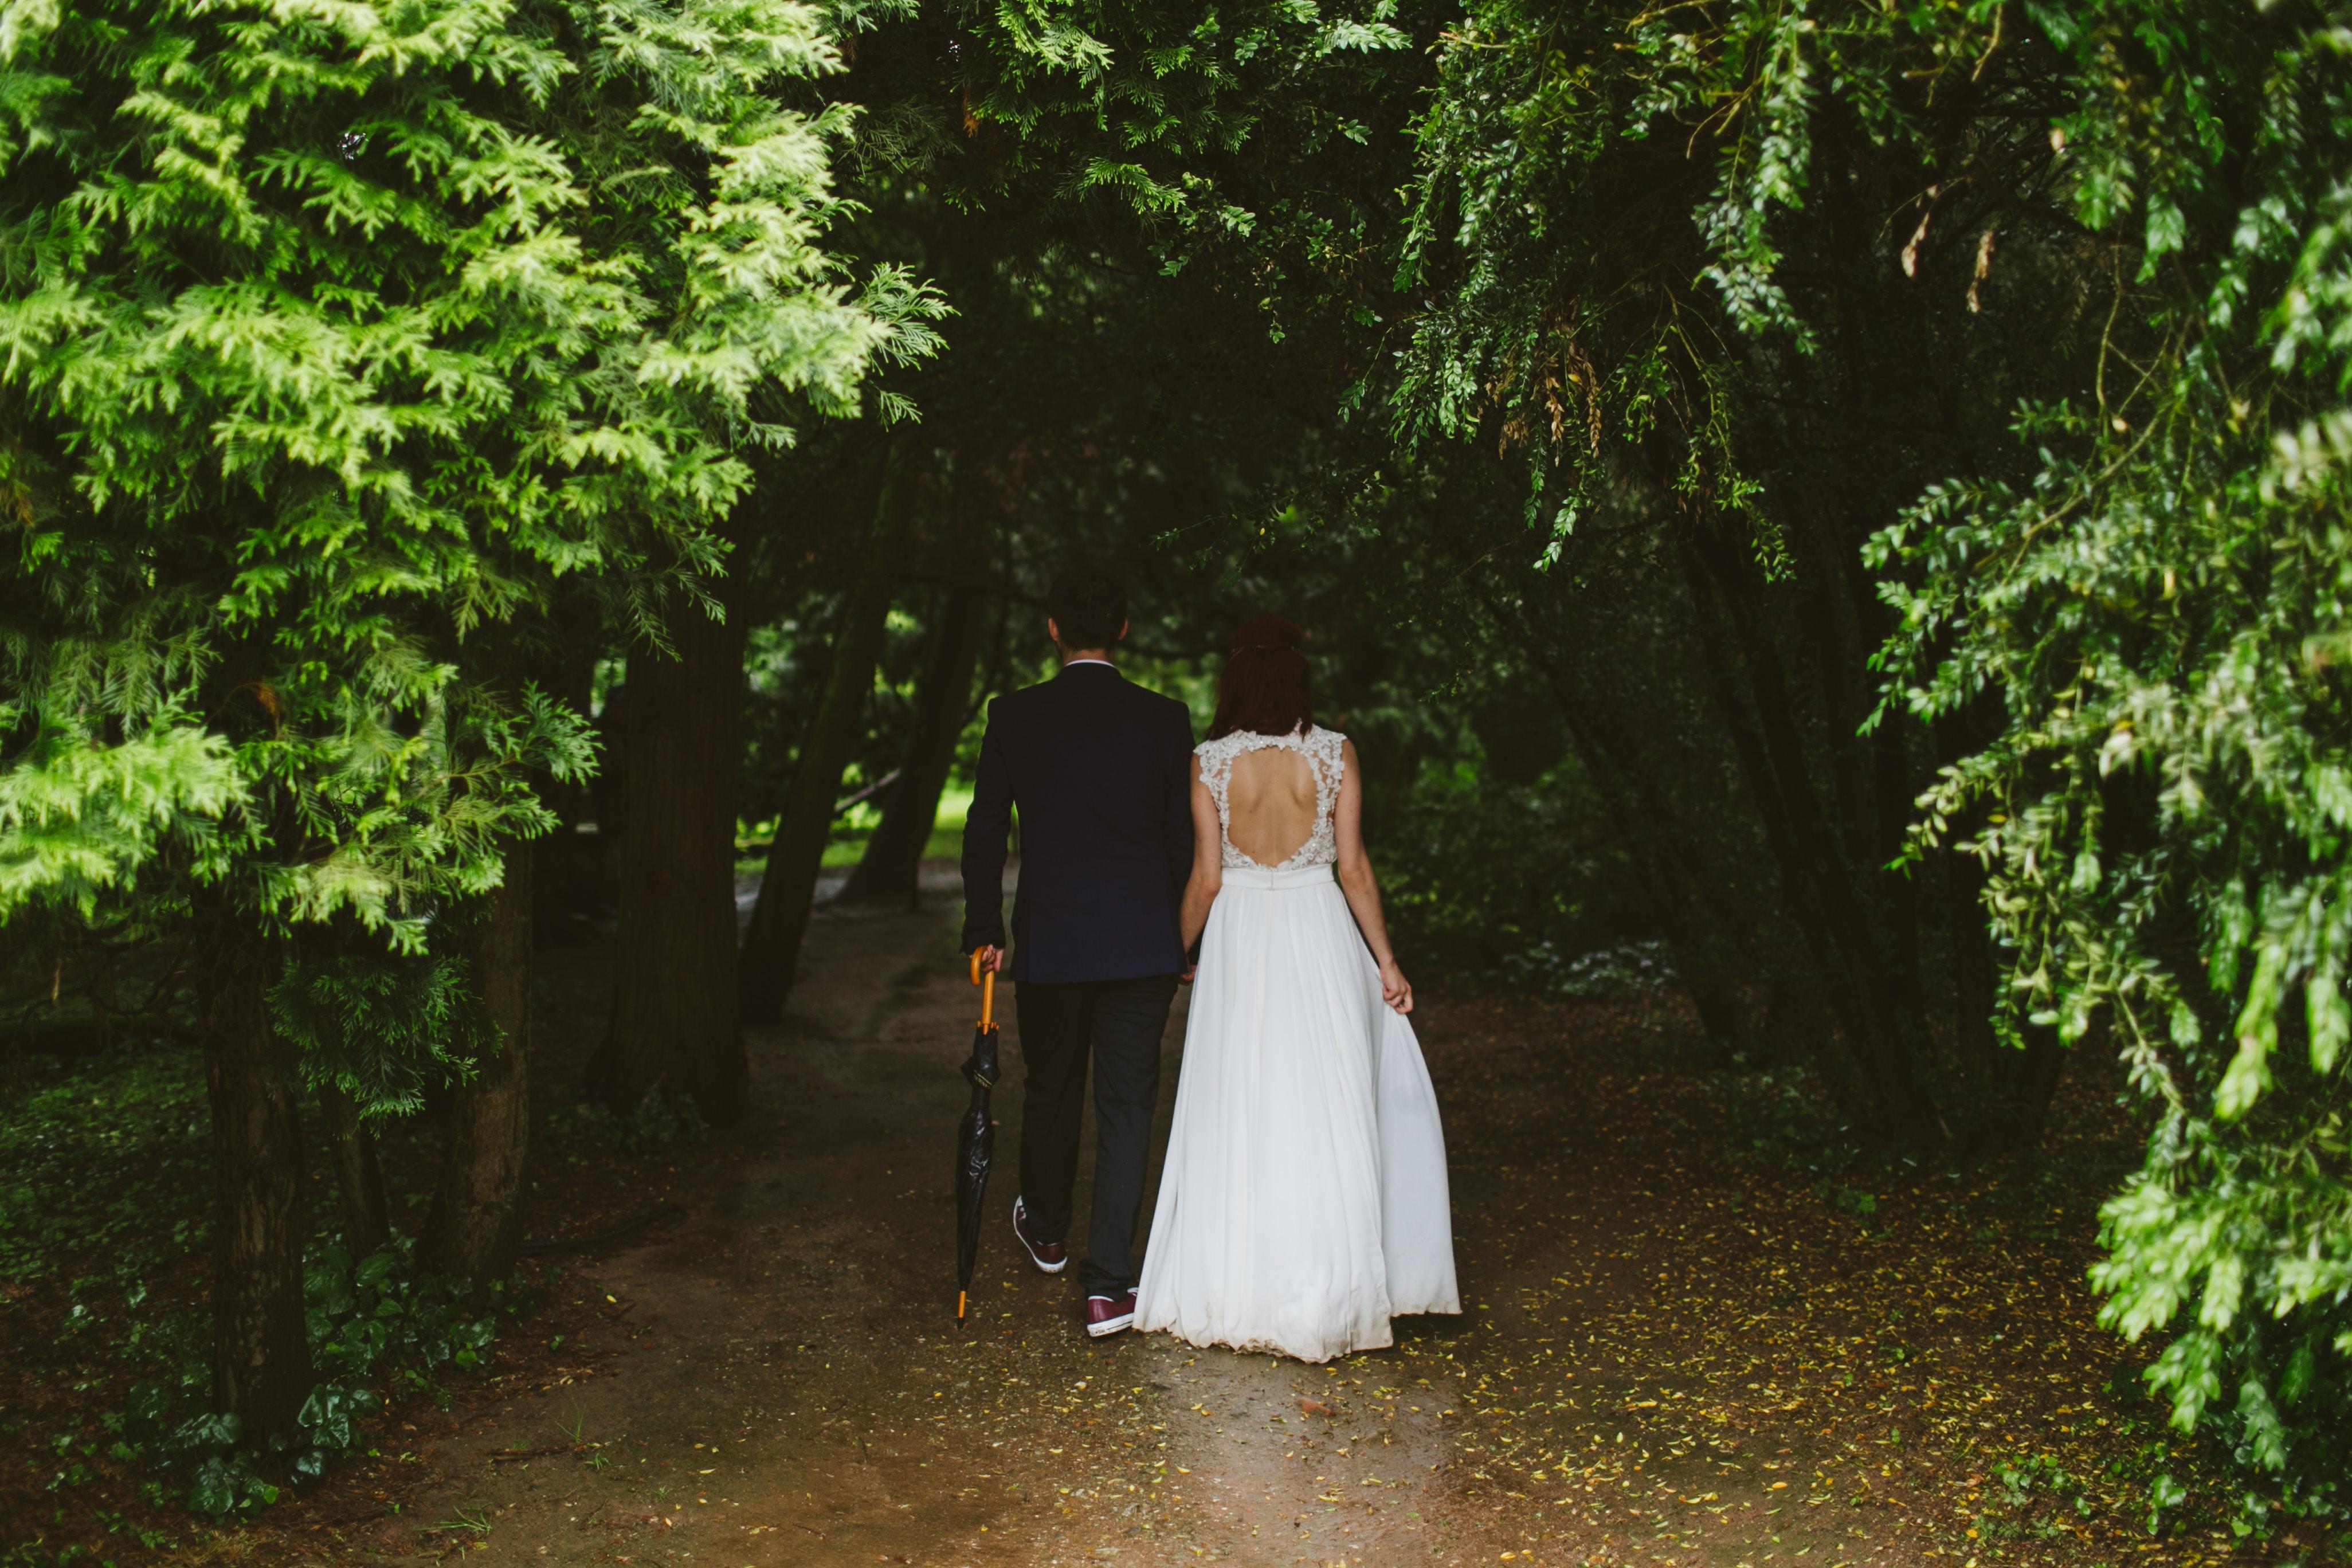 couple walking under green trees